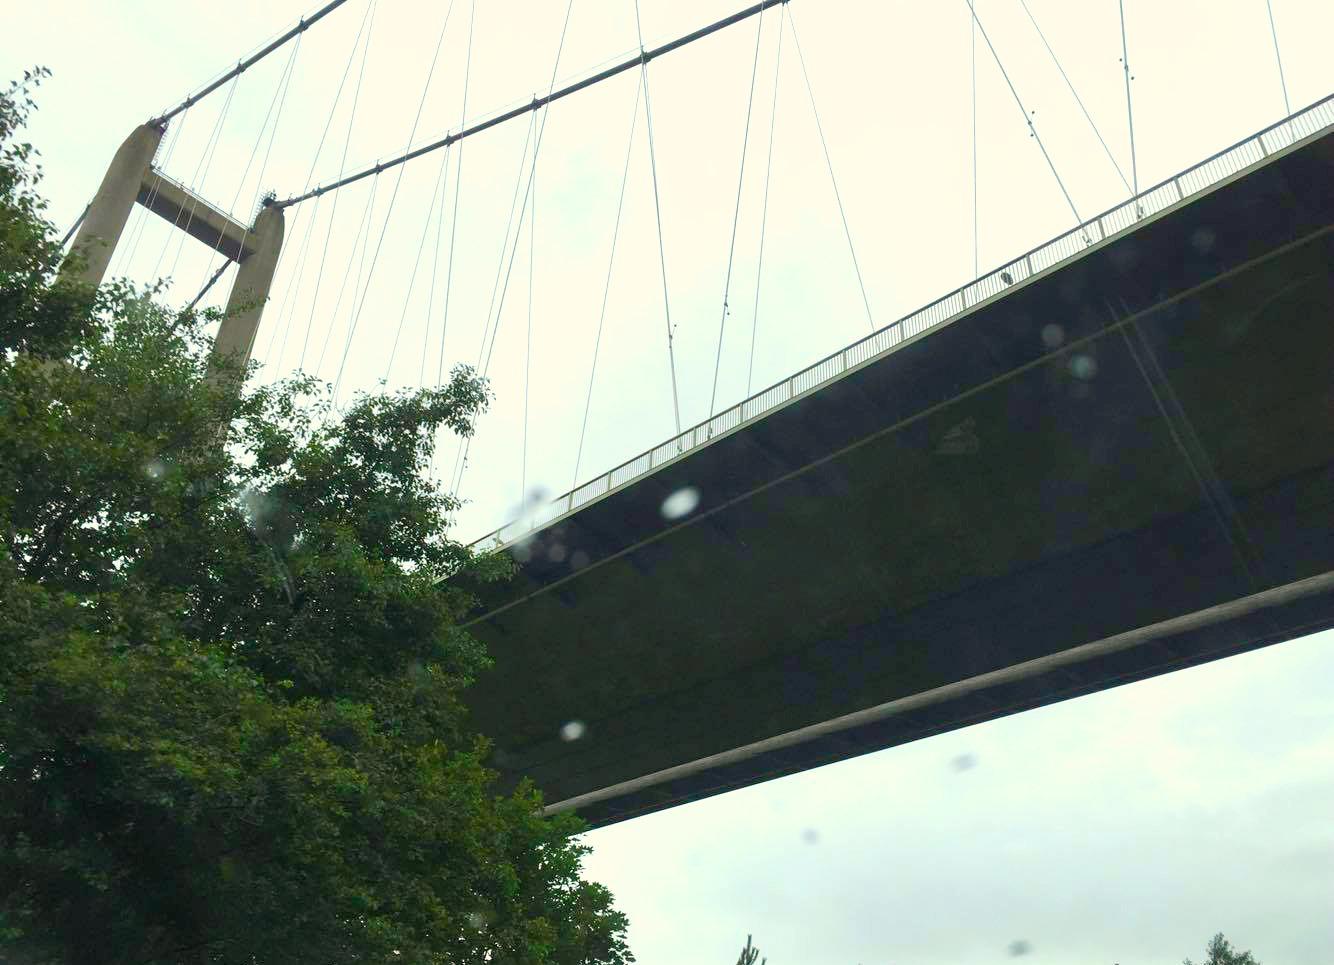 humber bridge, humberside, hull, university, kexgill, house,